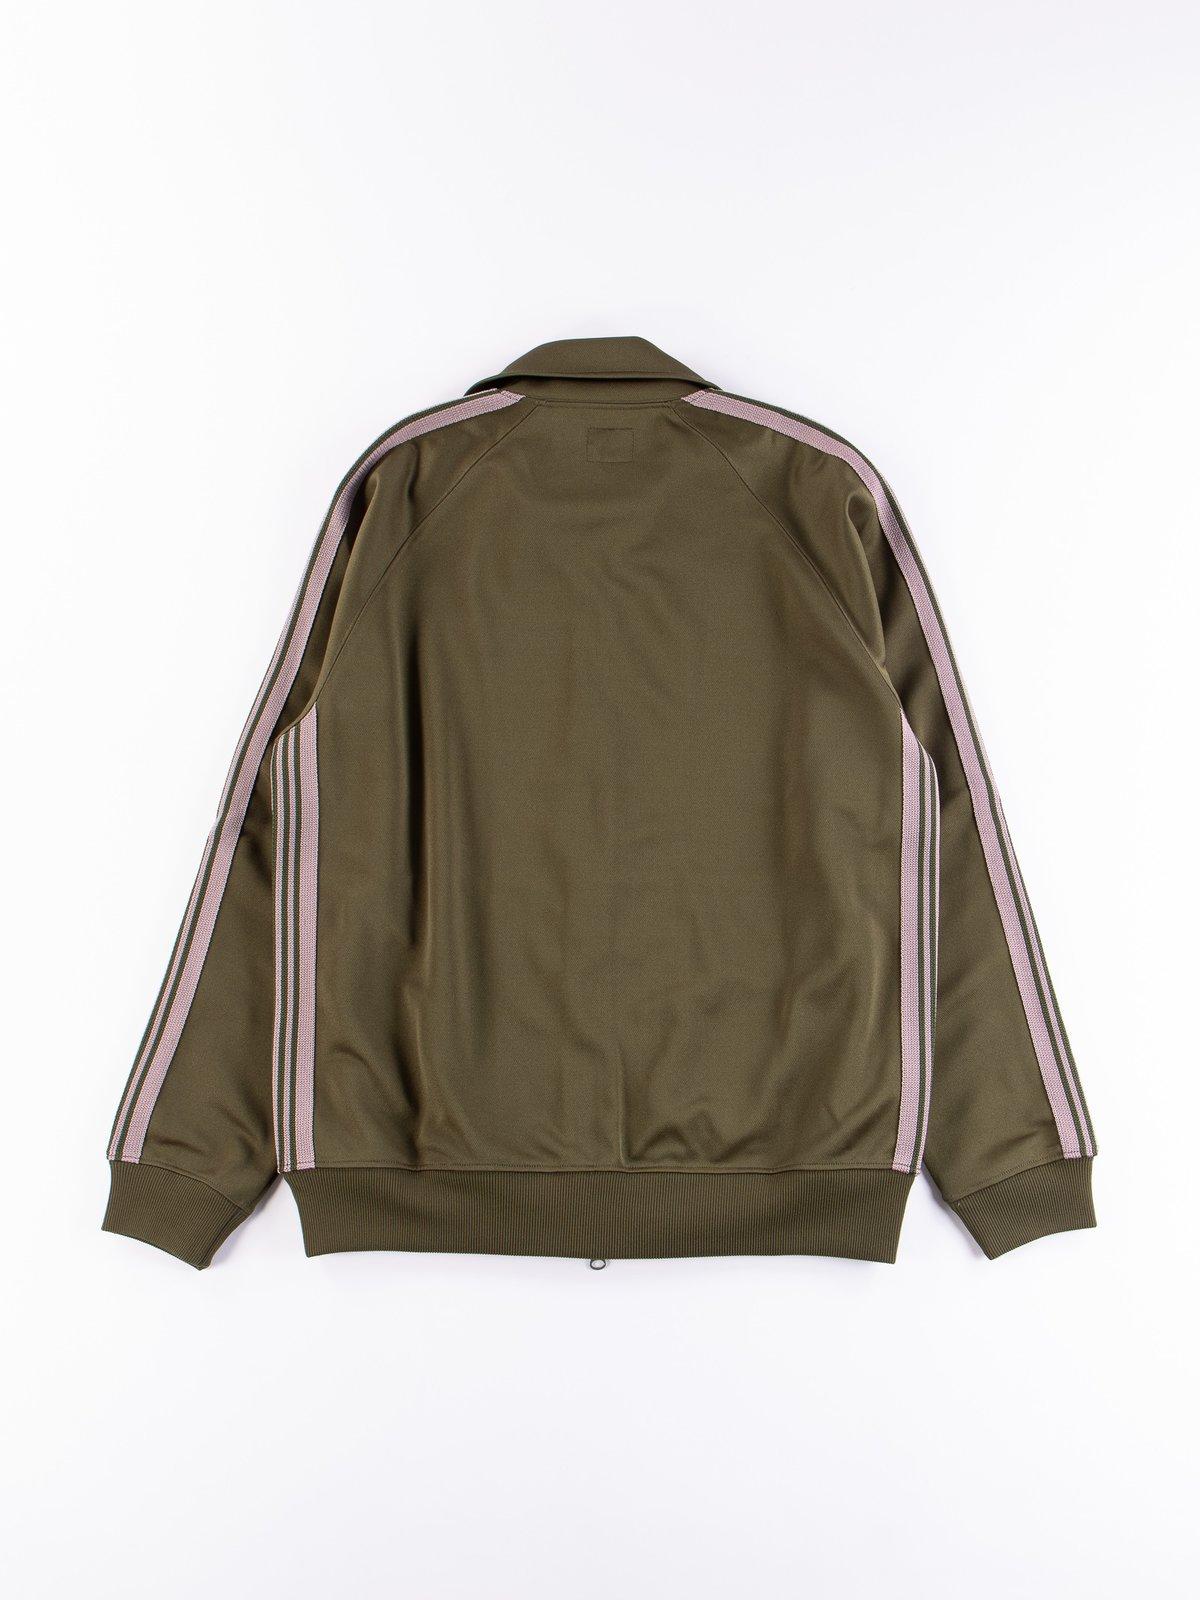 Olive Track Jacket - Image 6